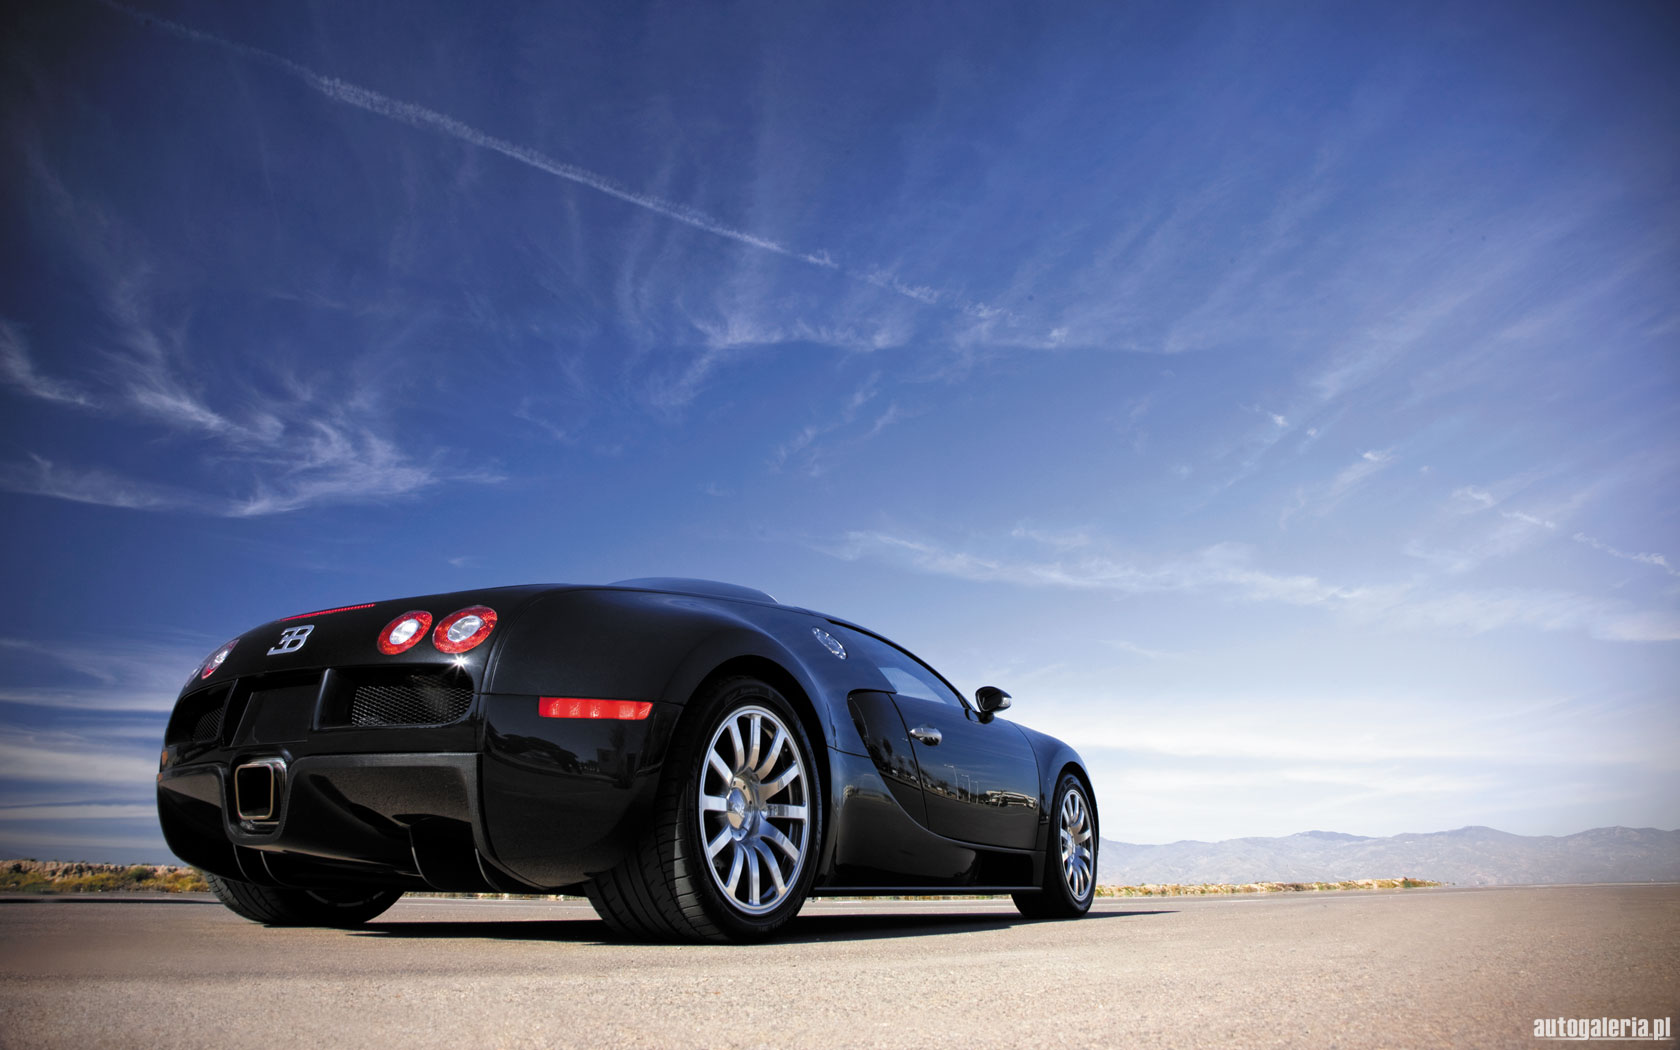 50 Super Sports Car Wallpapers That39ll Blow Your Desktop Away 1680x1050